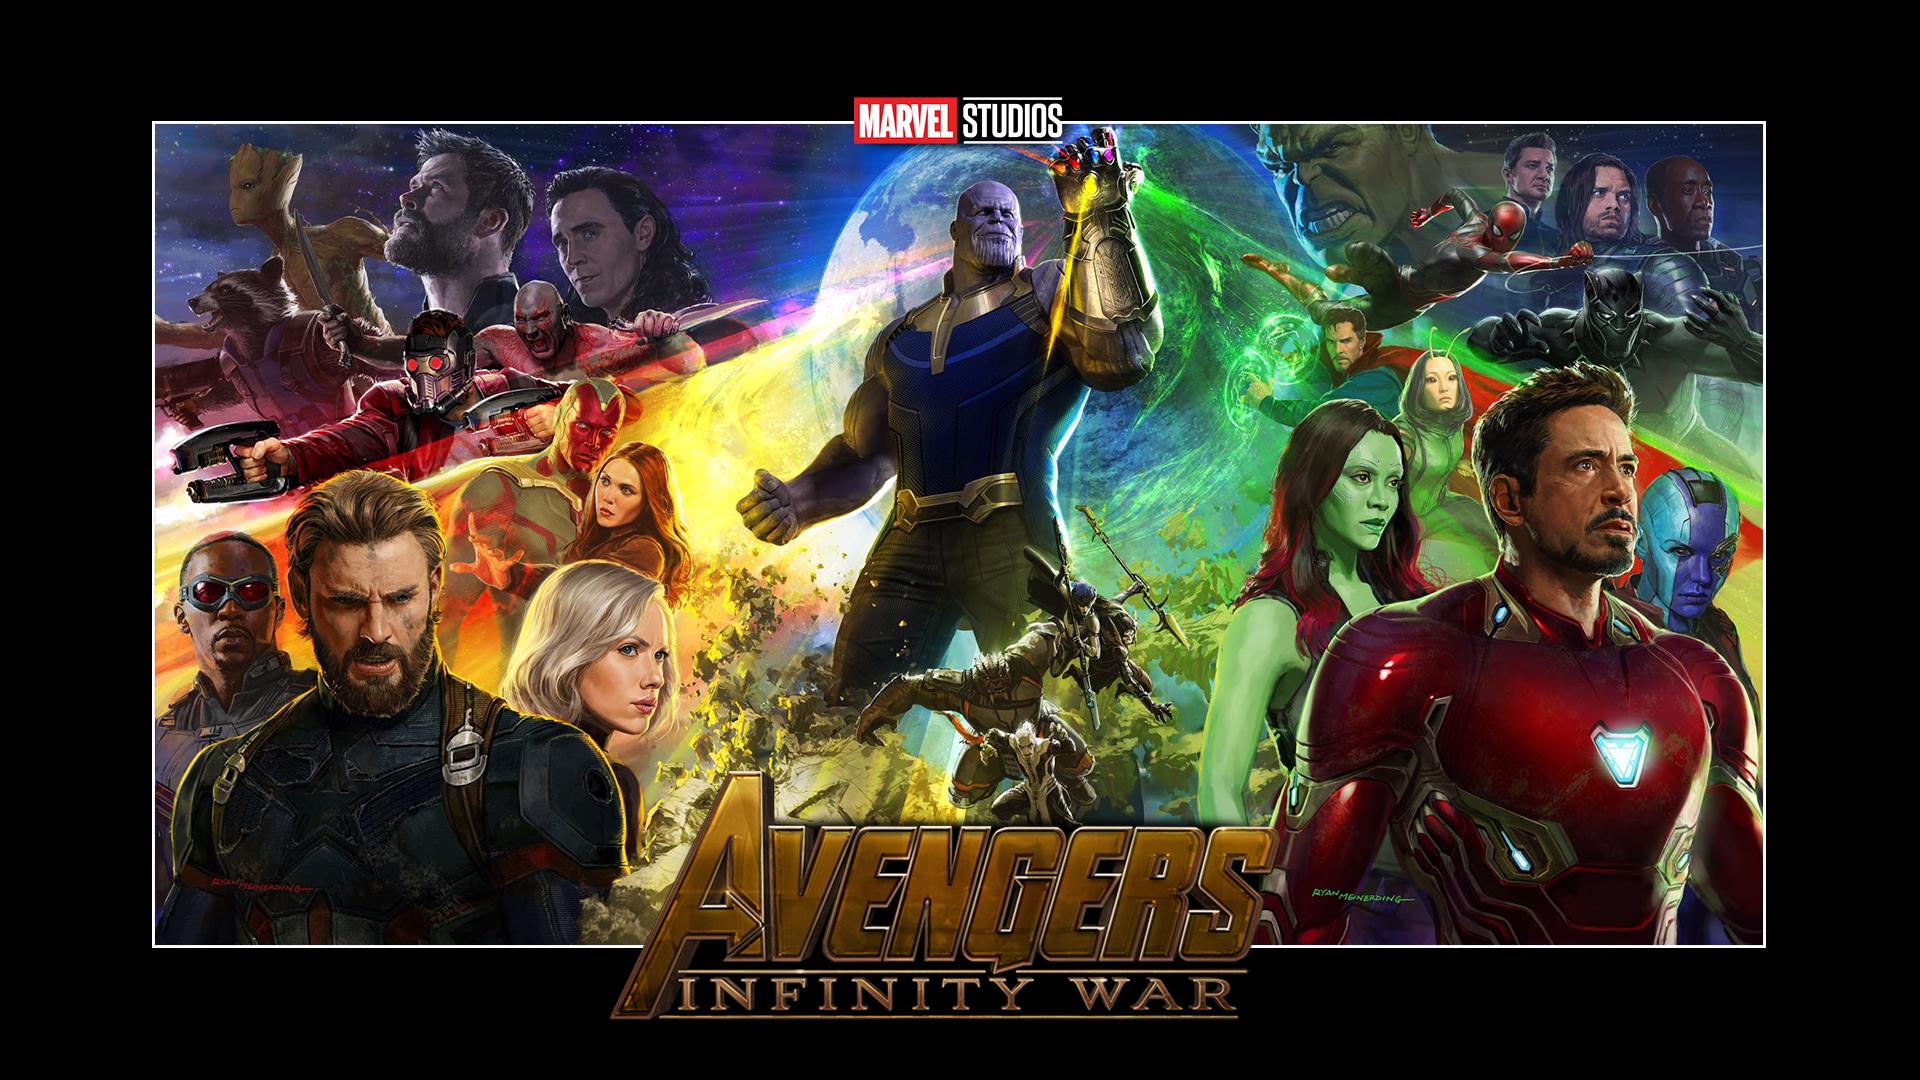 Home Decor Avengers Infinity War Avengers Endgame Stitching Desktop Wallpaper Poster 32x24 Home Garden Gefradis Fr